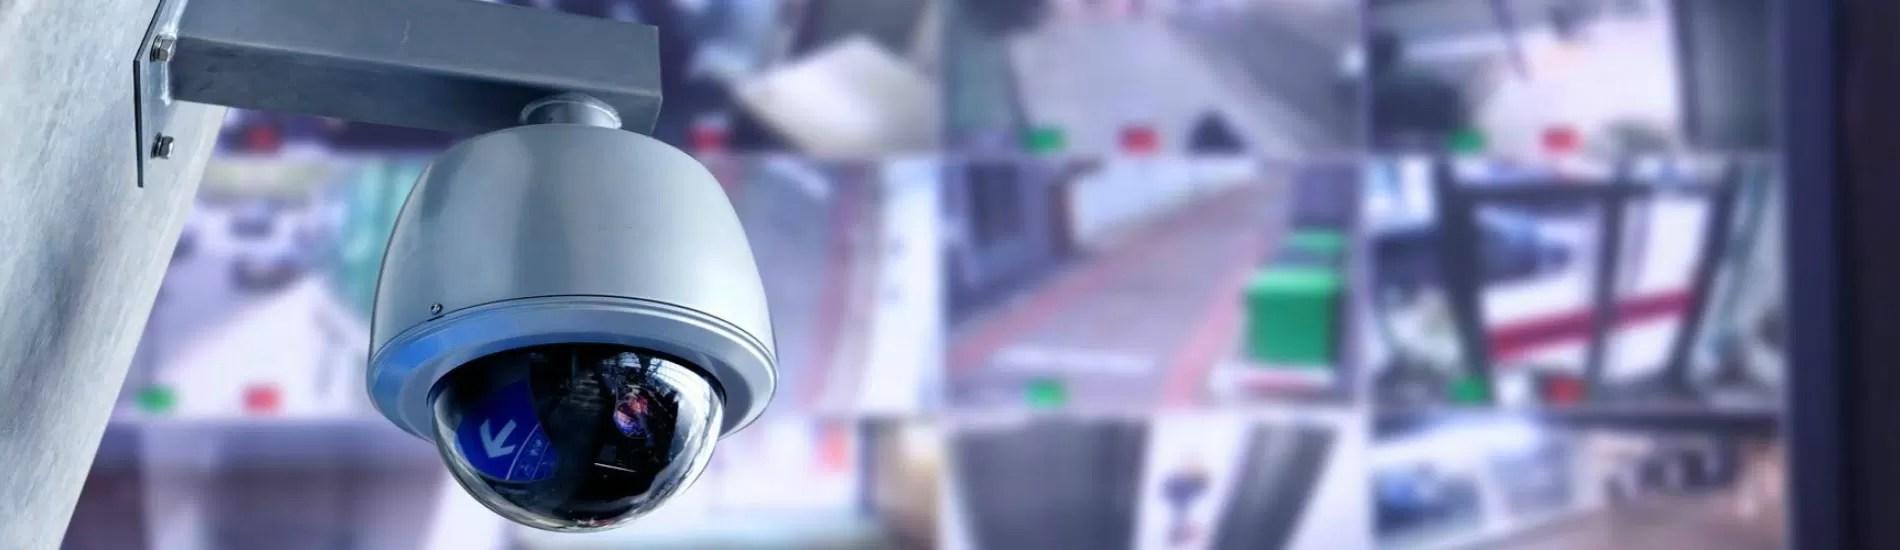 BBG security camera Cambridge